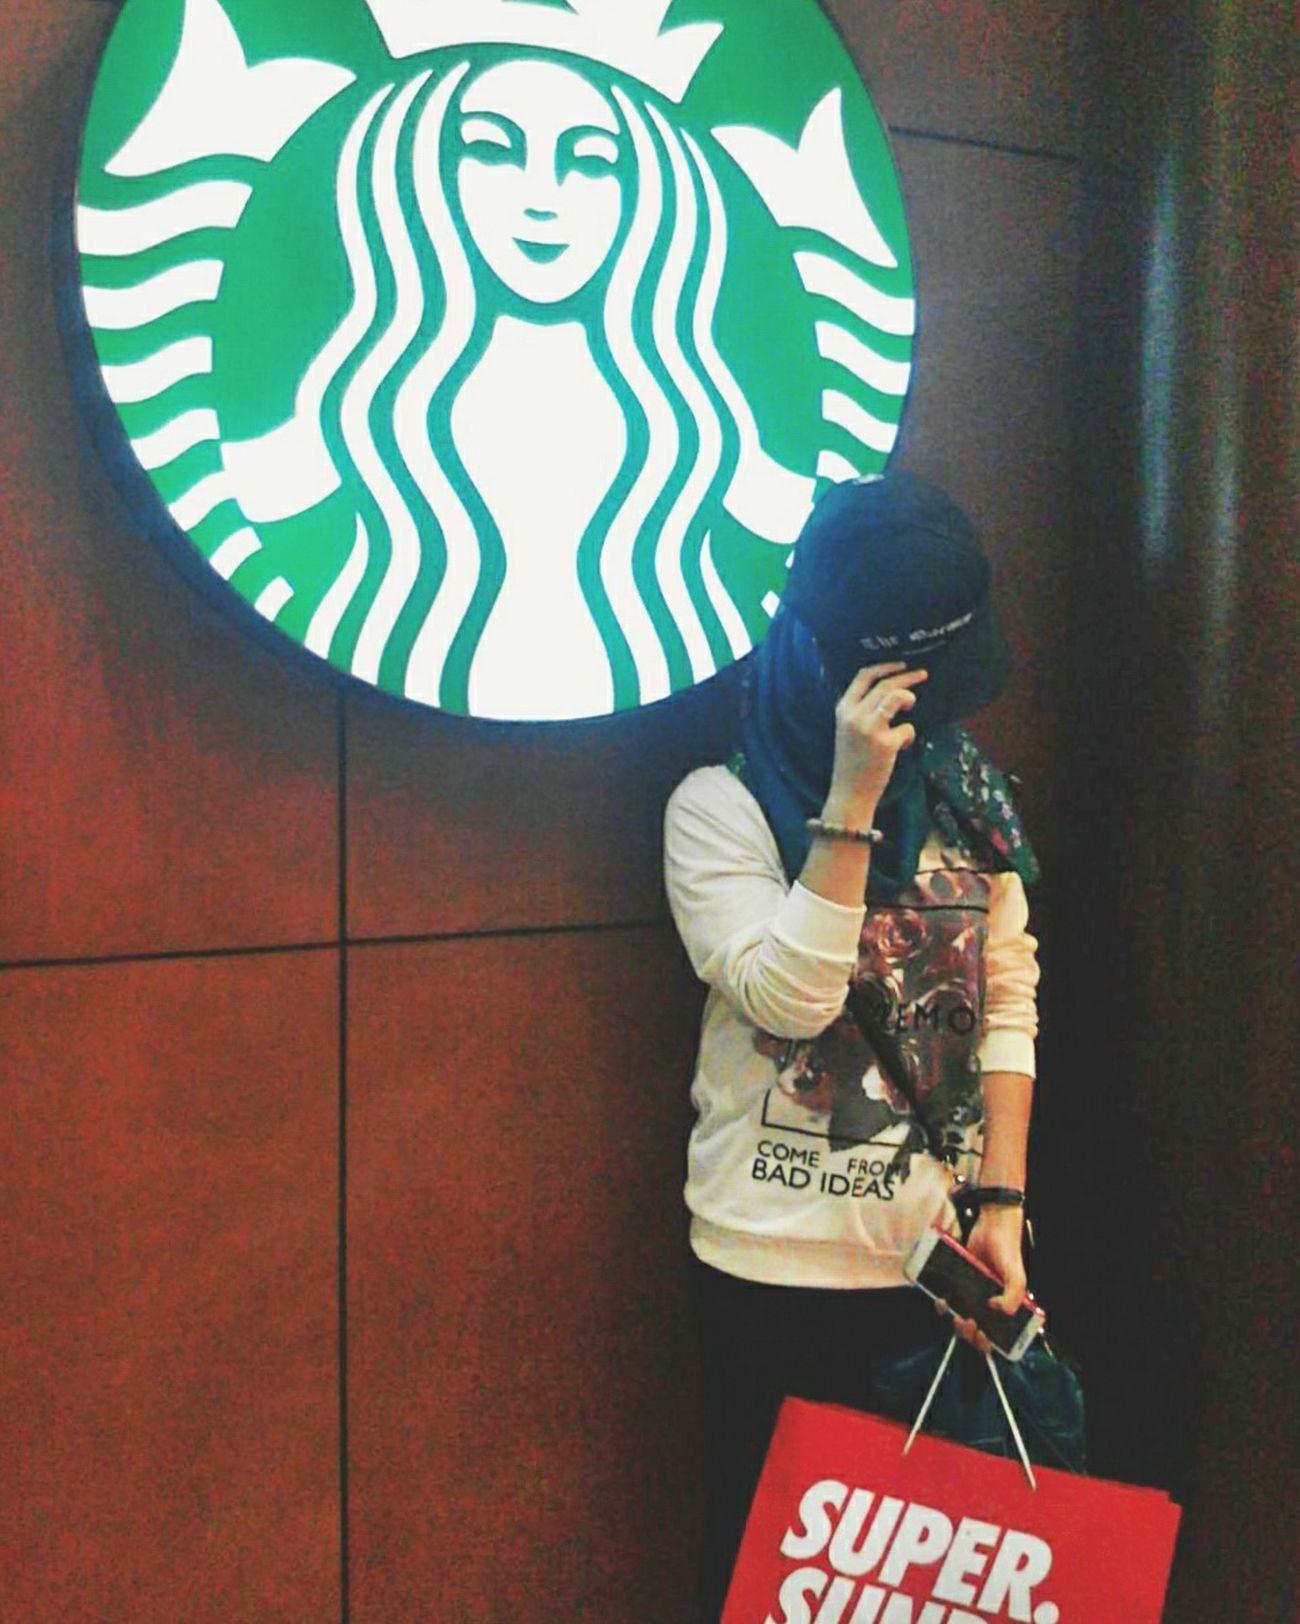 The Garment Starbuck Super Sunday